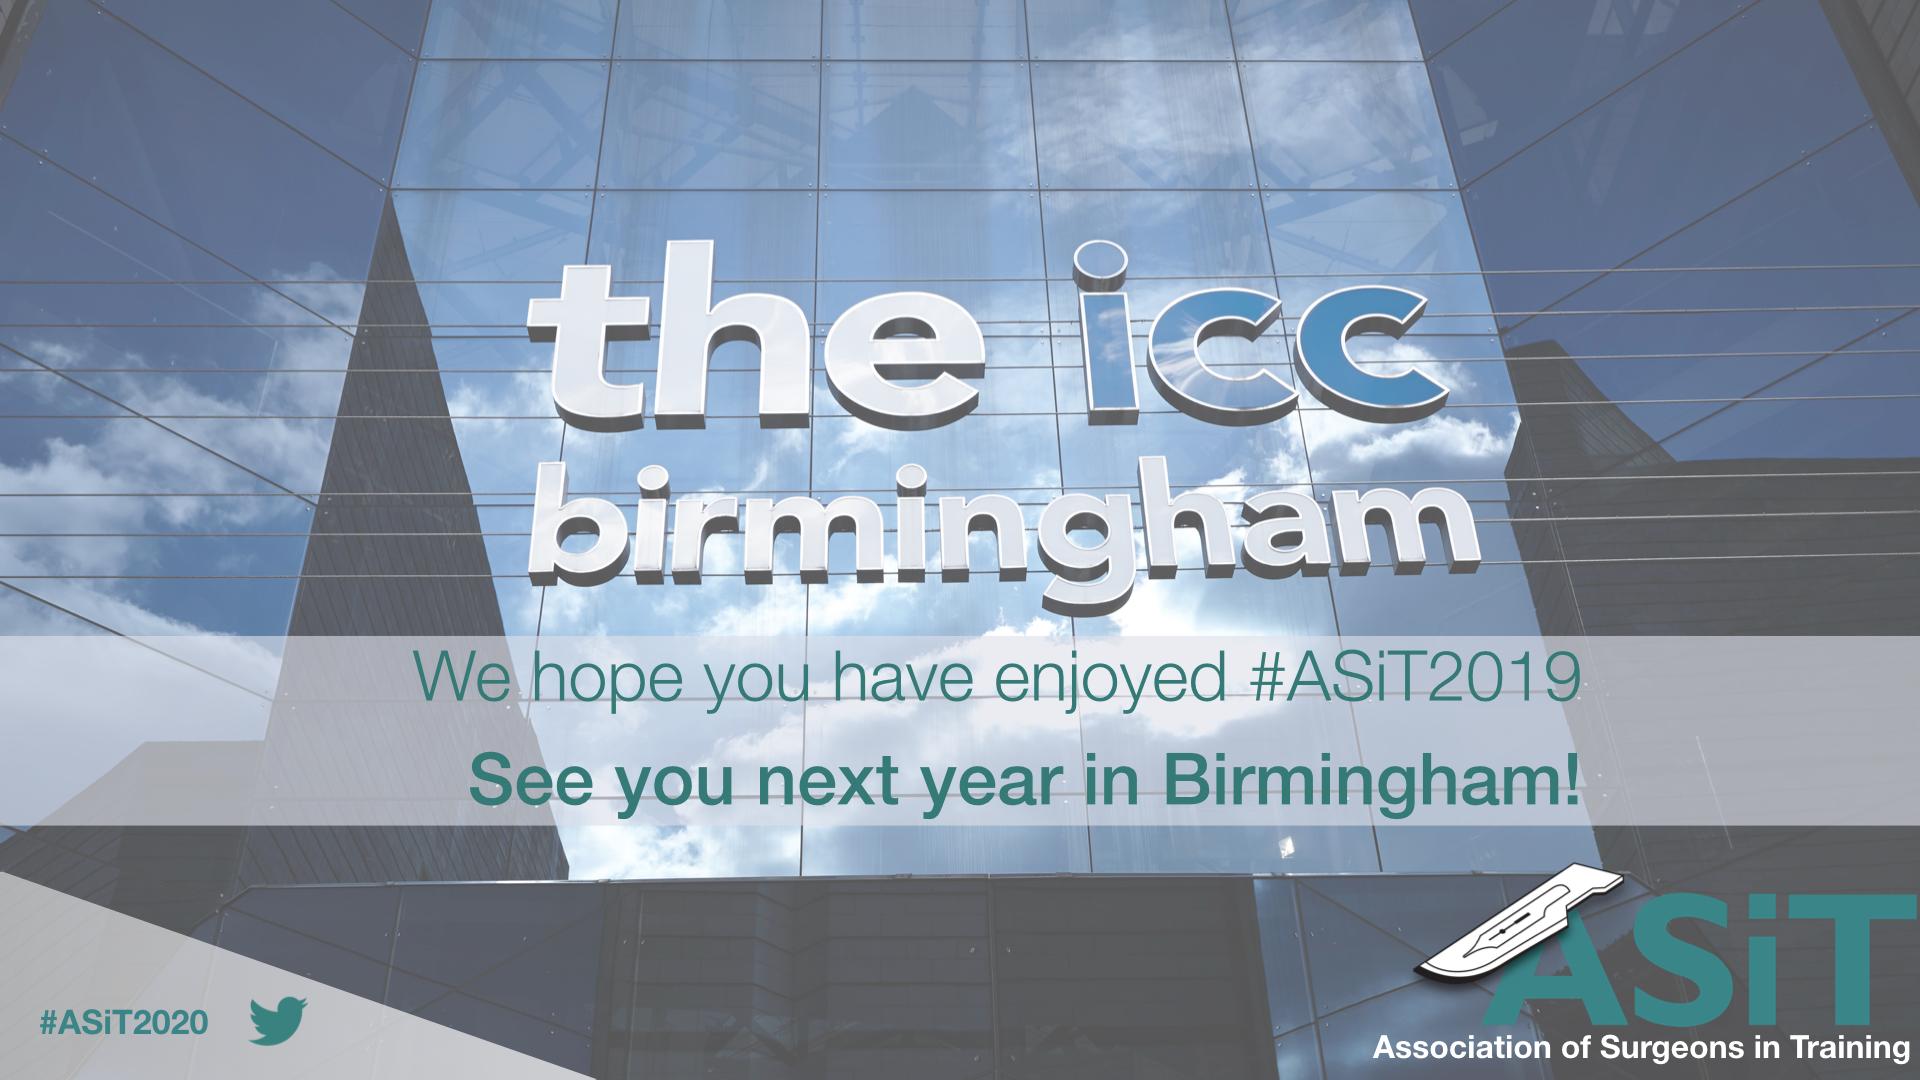 ASiT 2020 Conference Venue Announced!